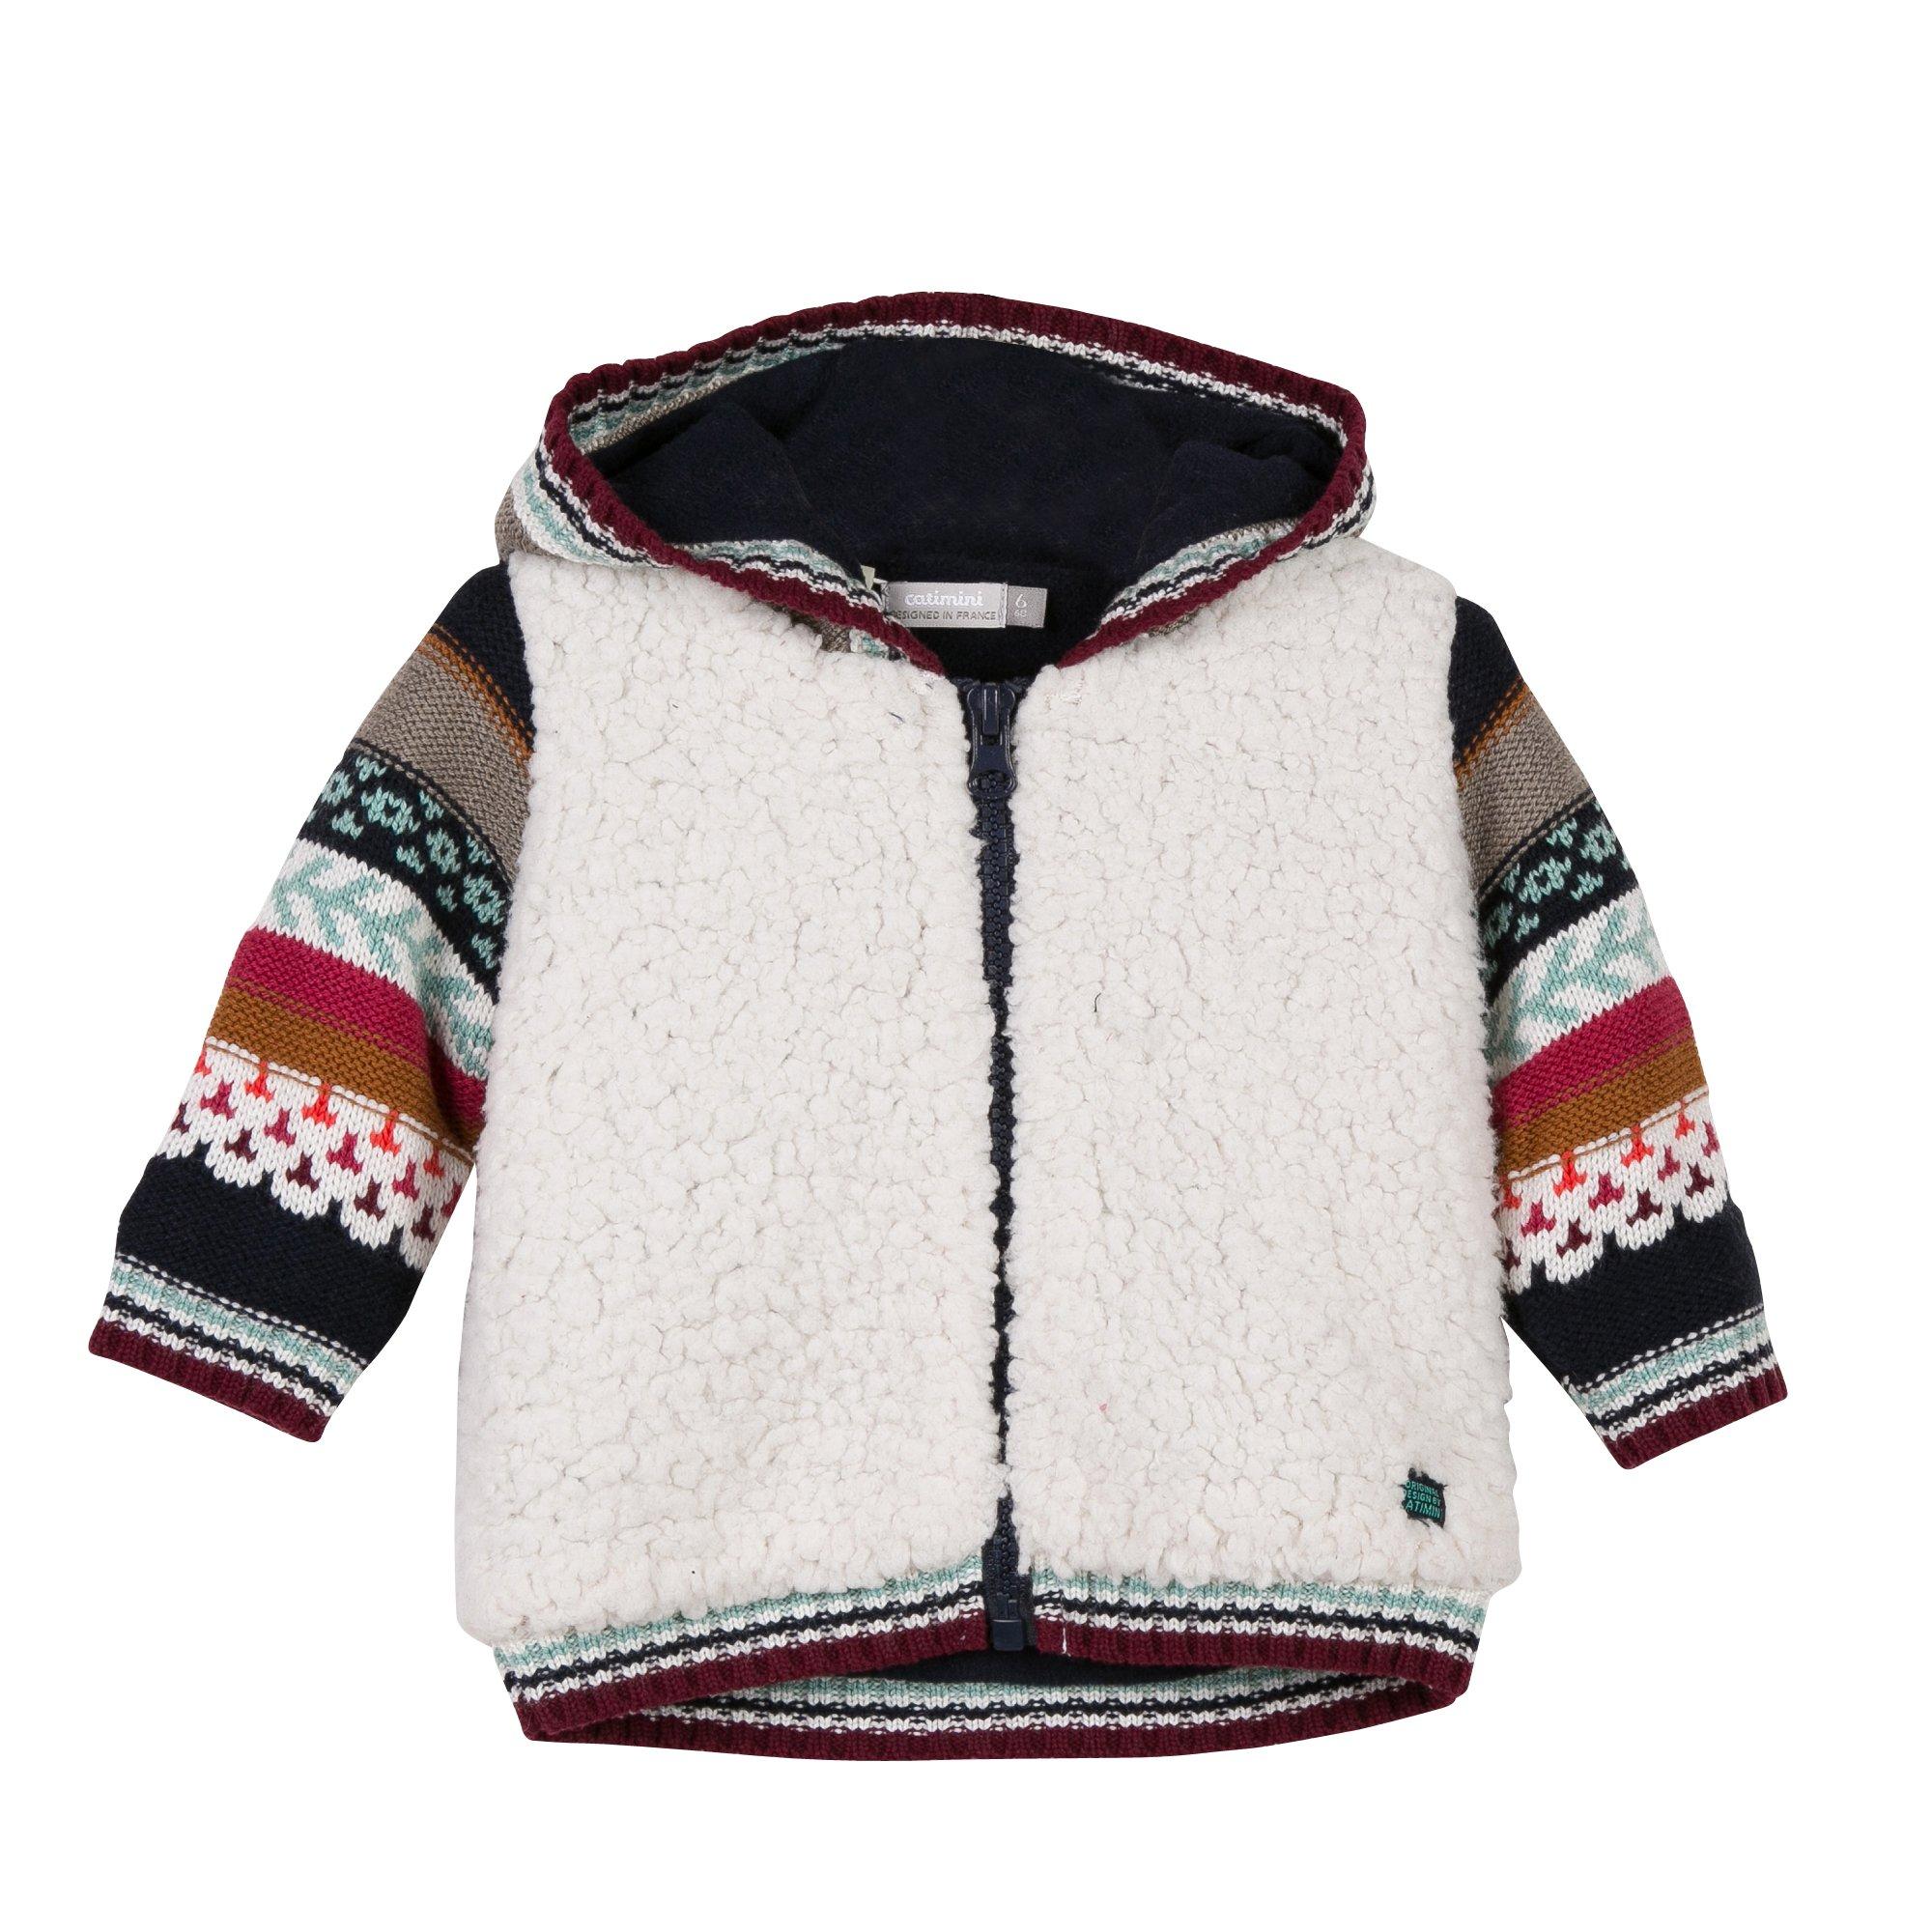 Catimini Cozy Sheepskin Nomad Hooded Cardigan (18 Months)